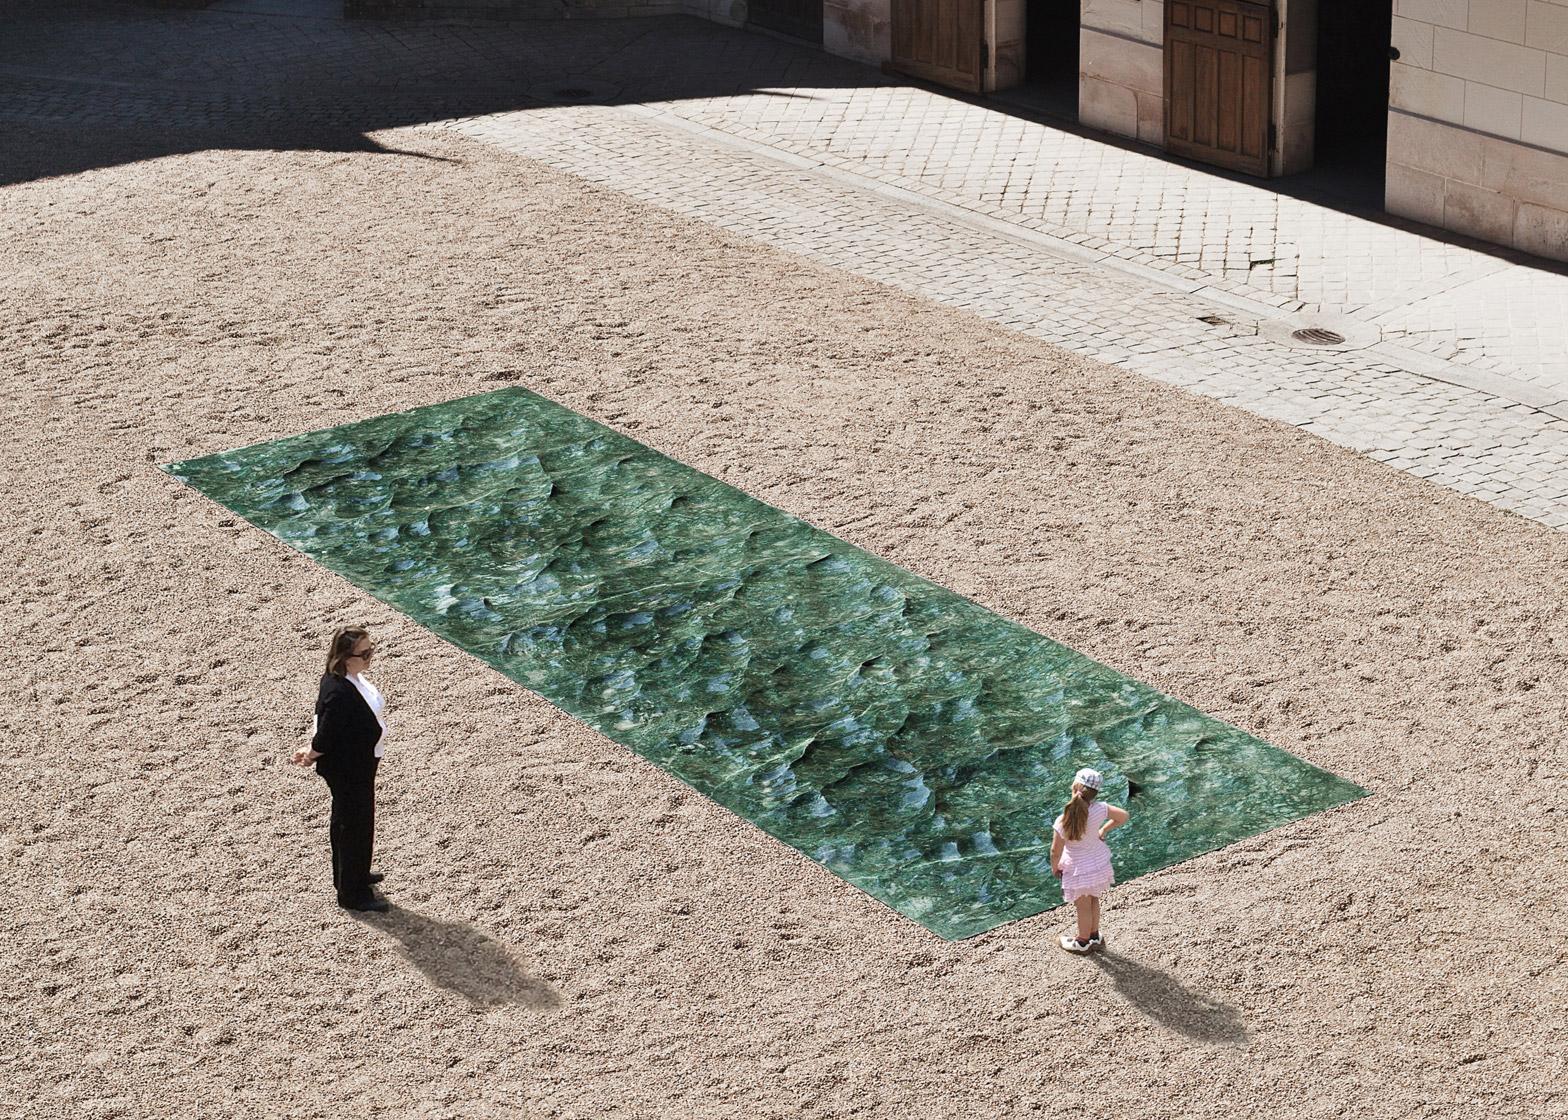 installazione piscina marmo designer mathieu lehanneur festival giardino francia loira